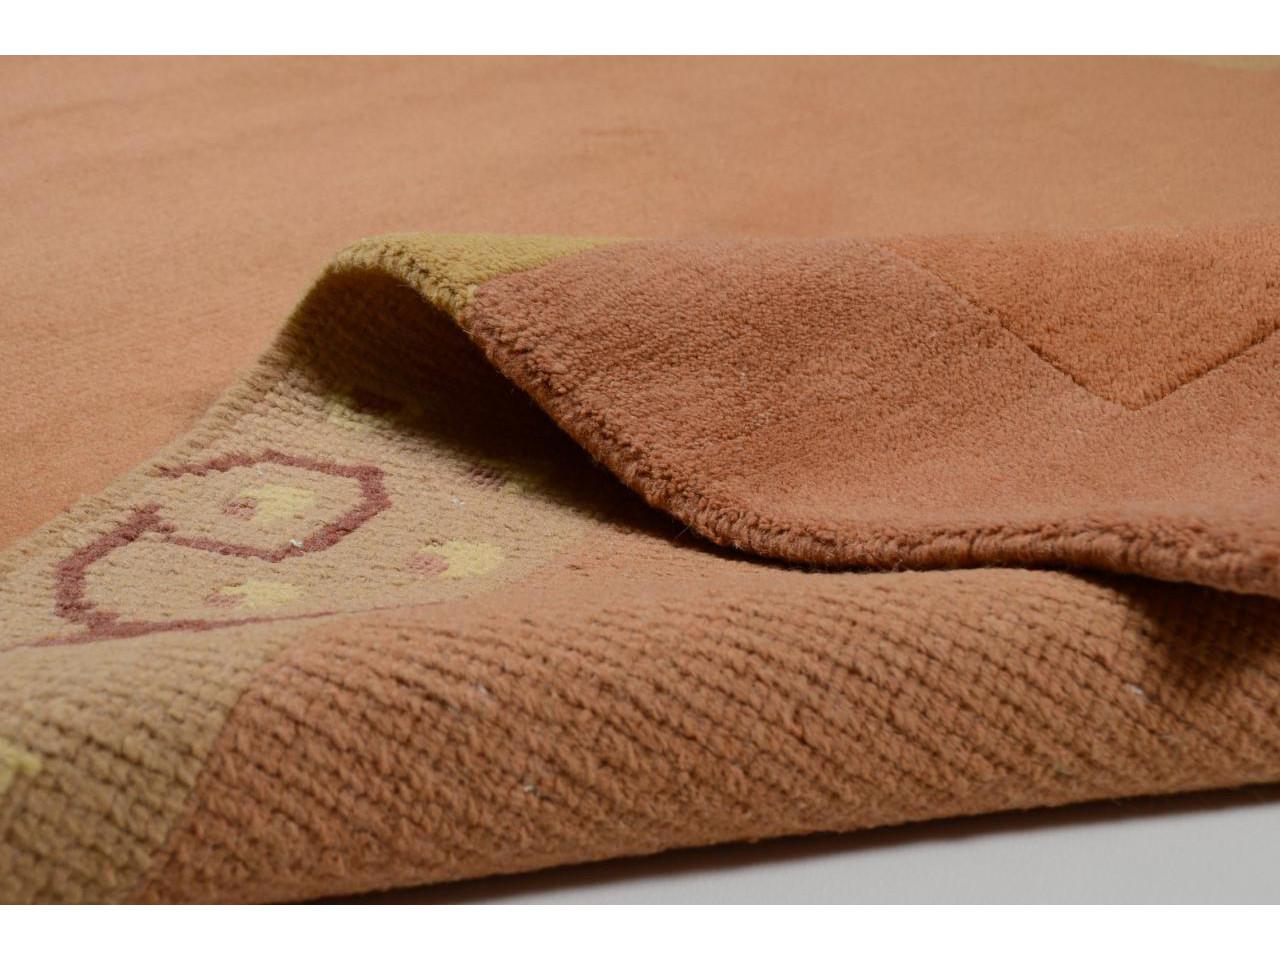 sierra terra tapis bordures n 1941 200x200cm. Black Bedroom Furniture Sets. Home Design Ideas